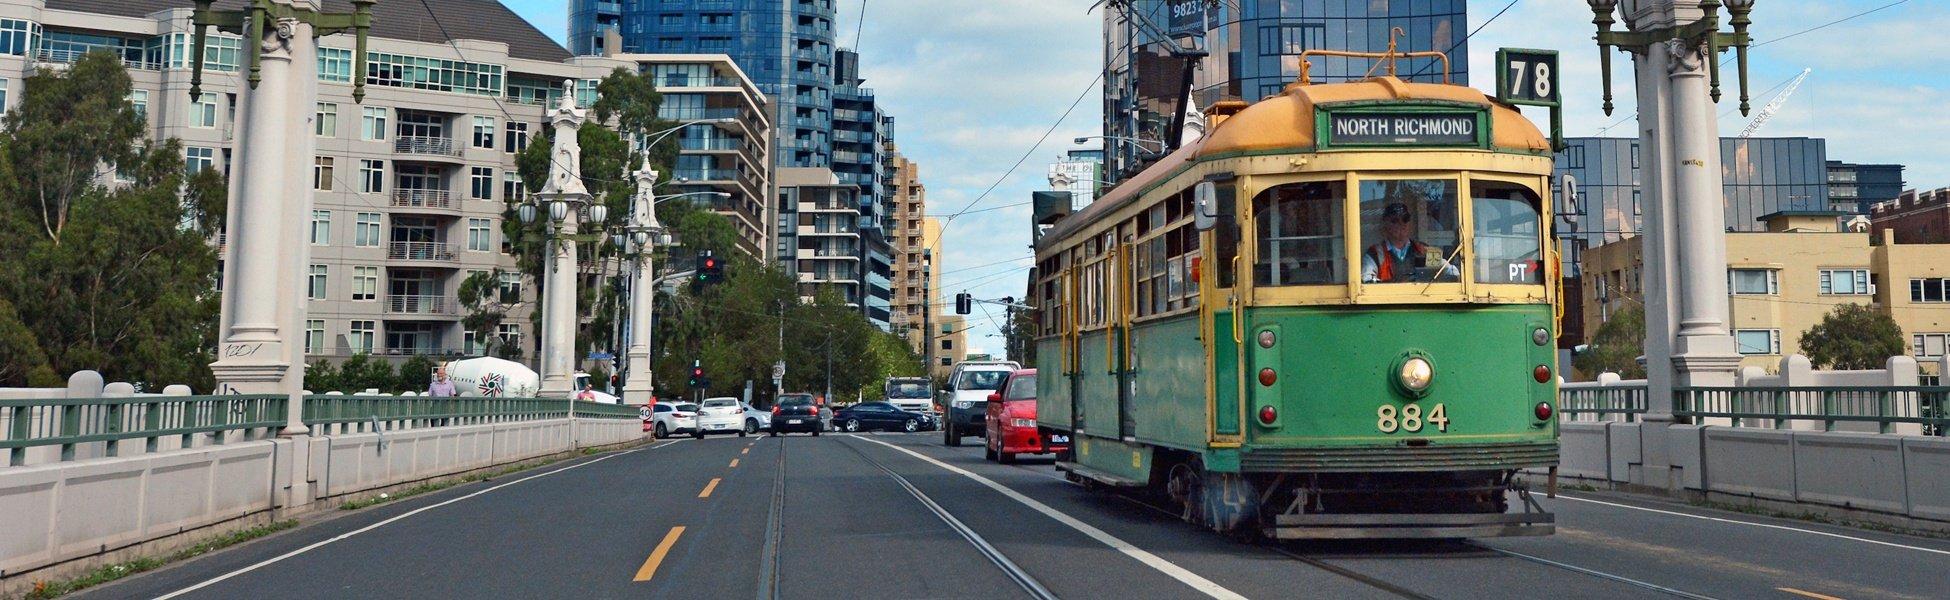 Melbourne_GettingAroundBanner_1.jpg